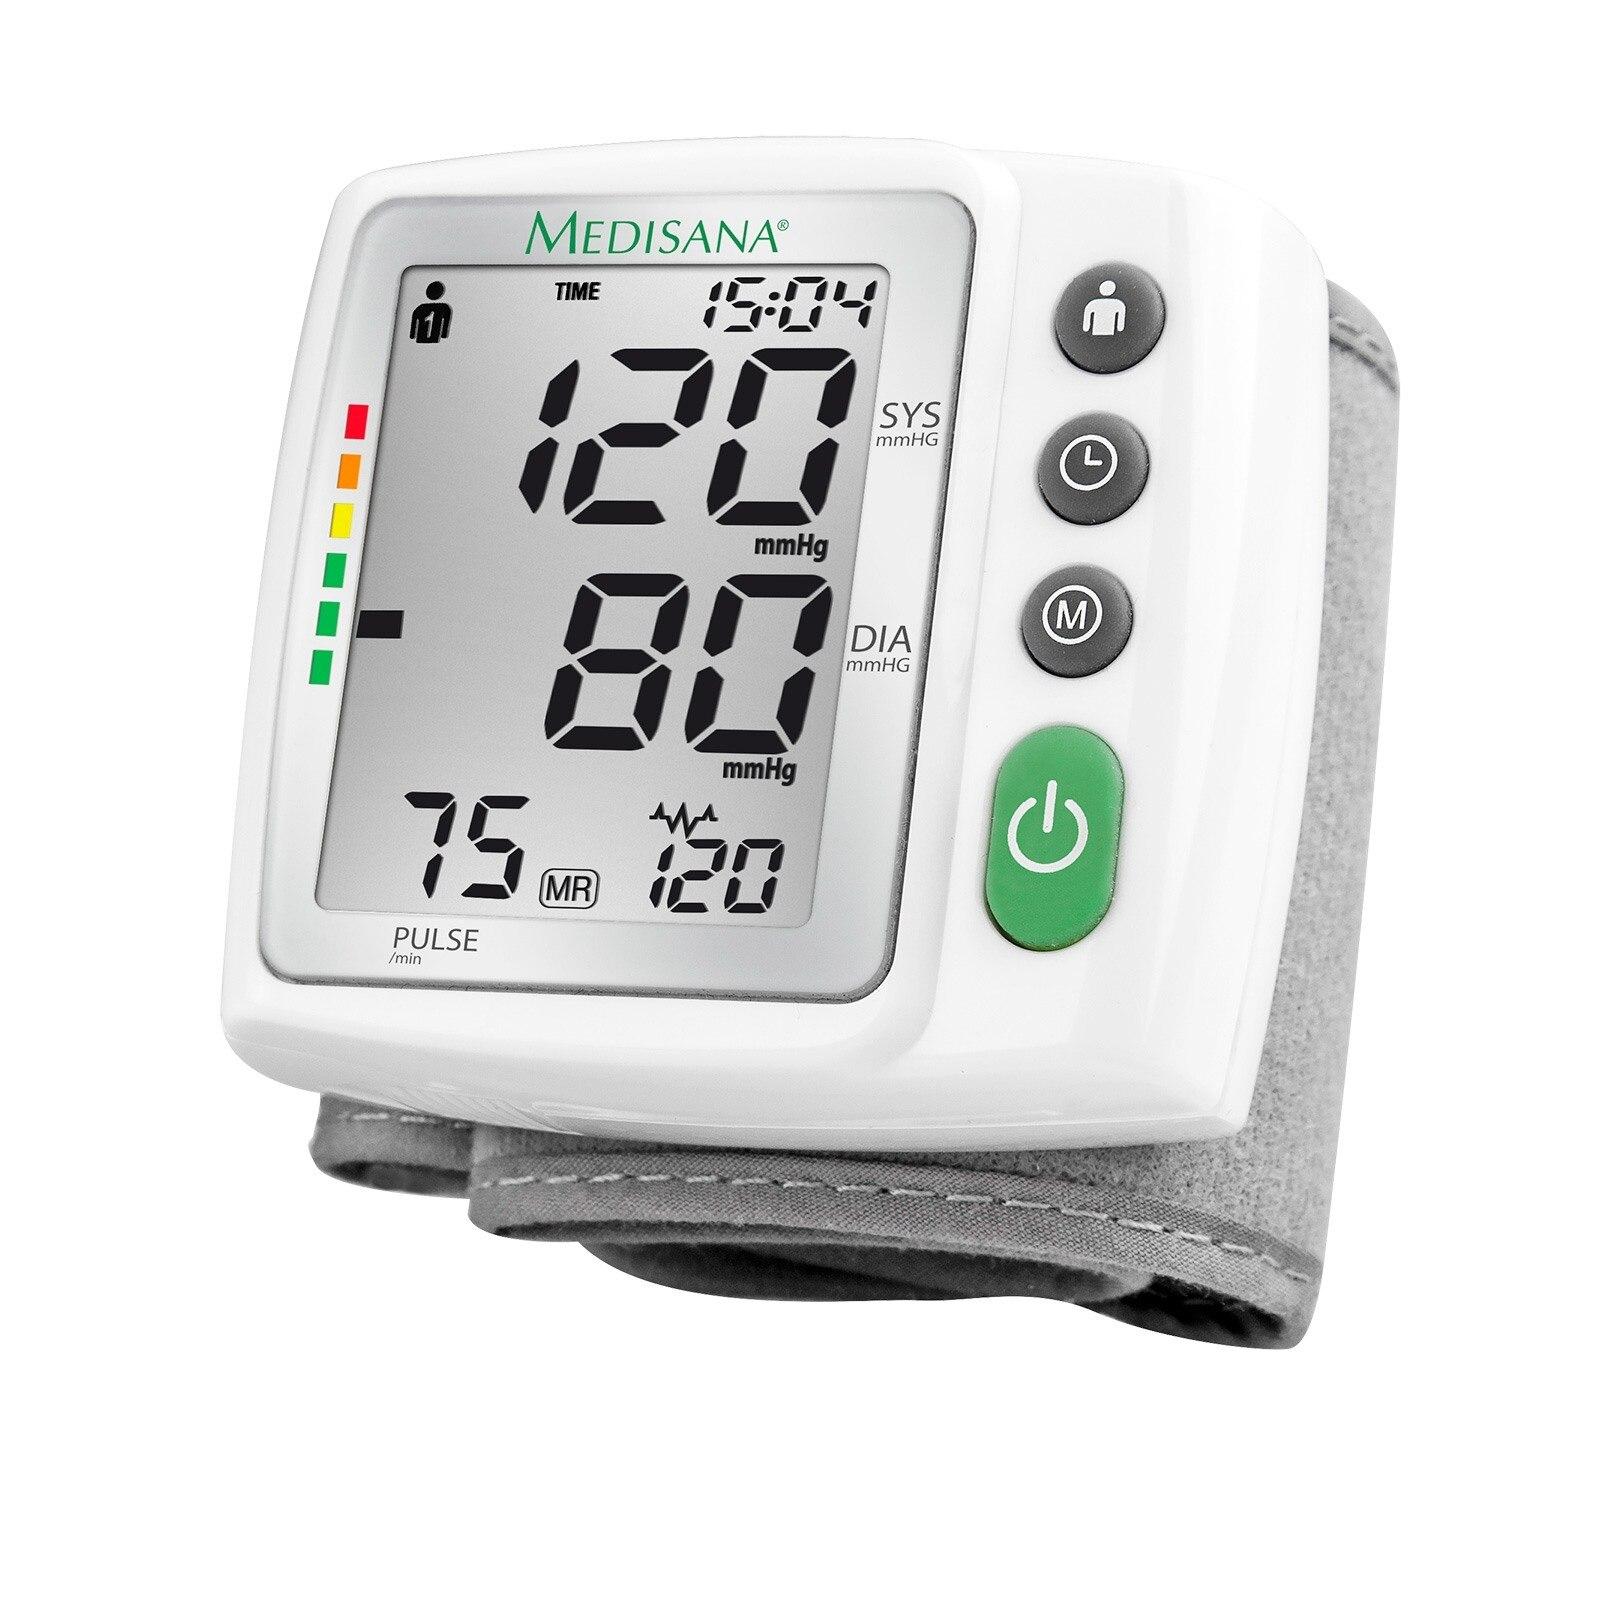 Ebebek Medisana Wrist Blood Pressure Monitor